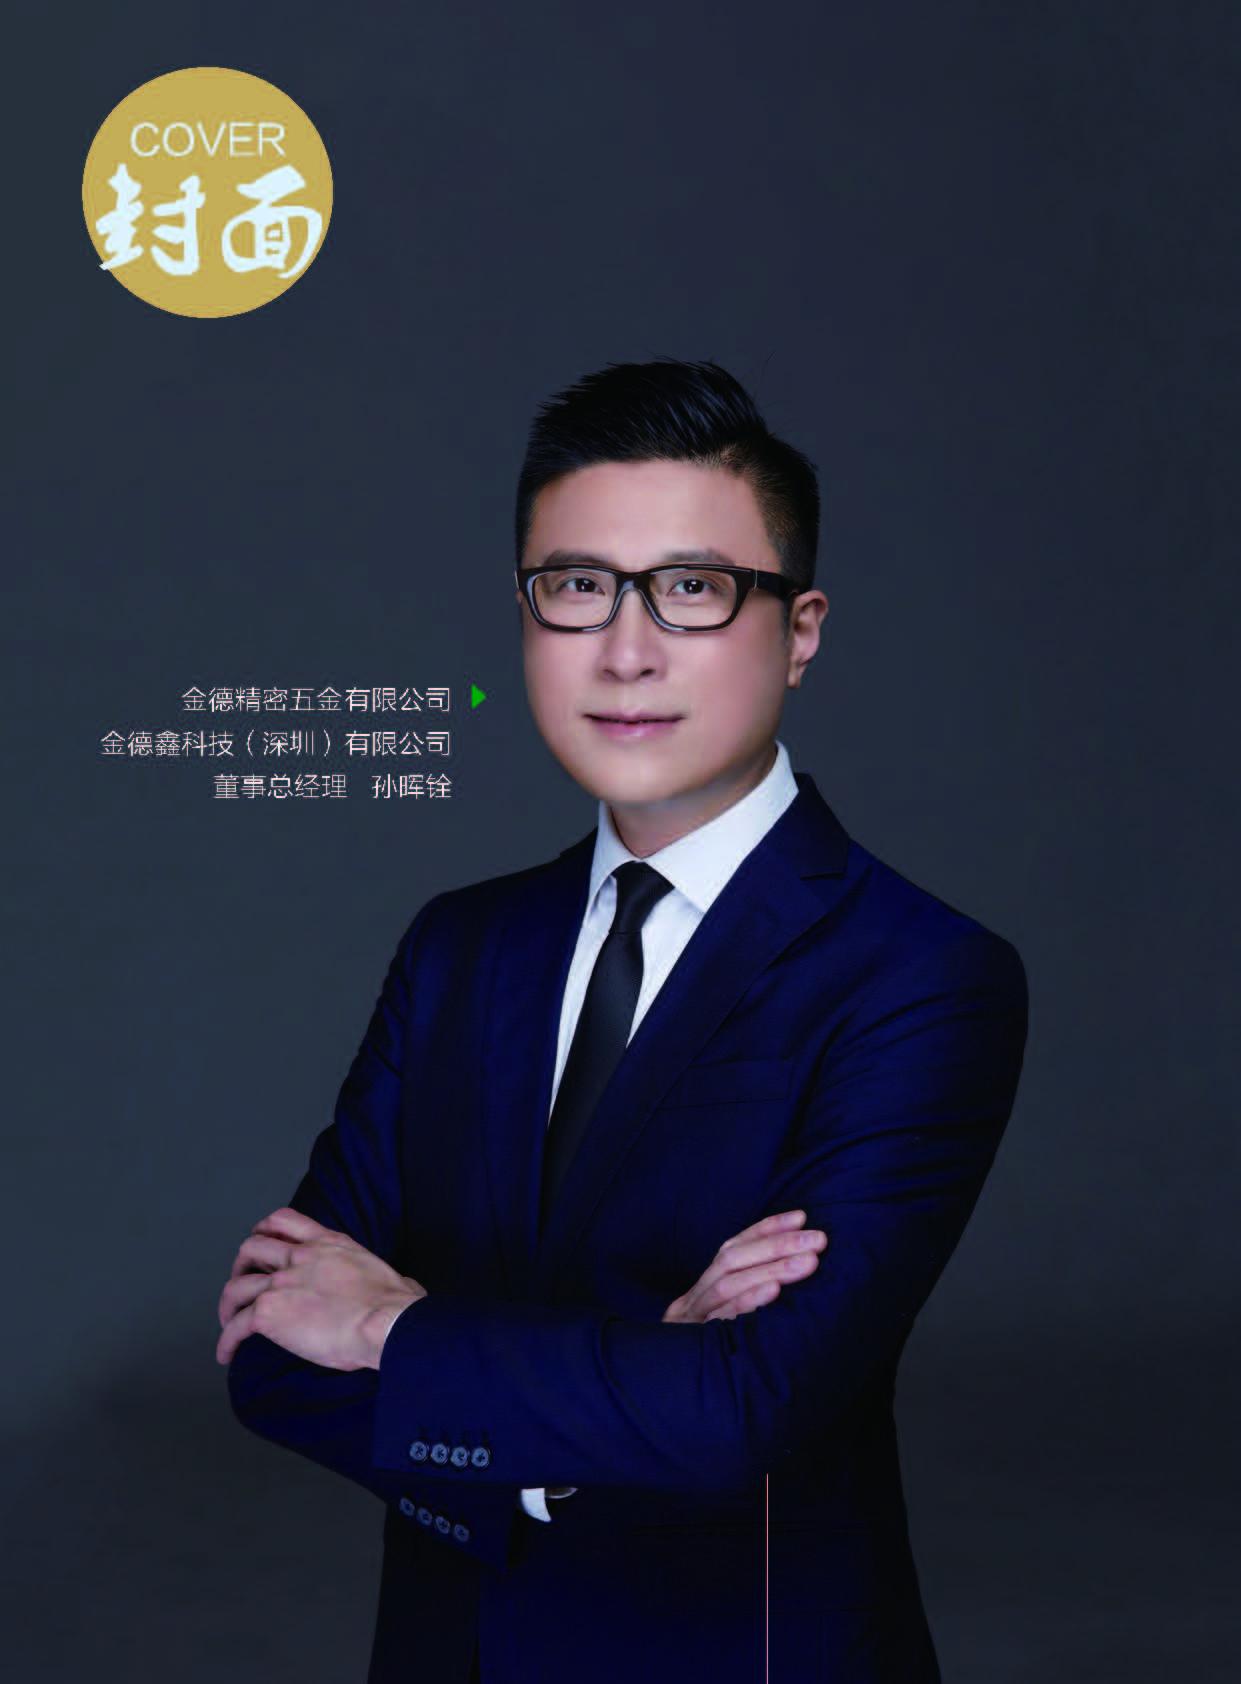 Pages from KFM金德:精密金属工程供应商——MFC《金属板材成形》杂志2021年第八期.jpg